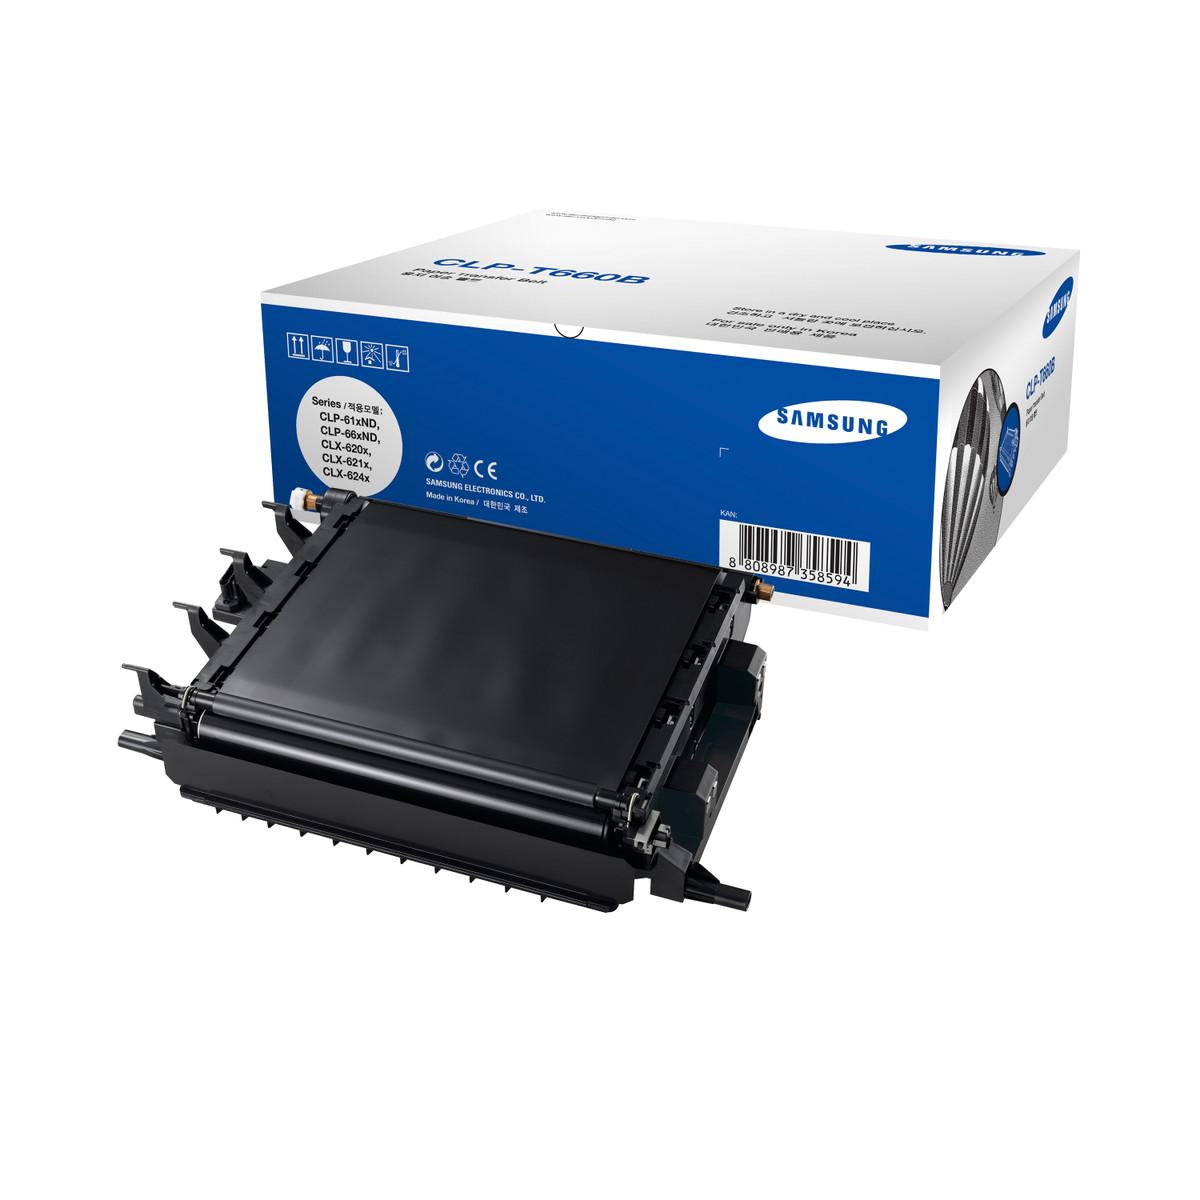 Samsung CLPT660B Transfer Unit